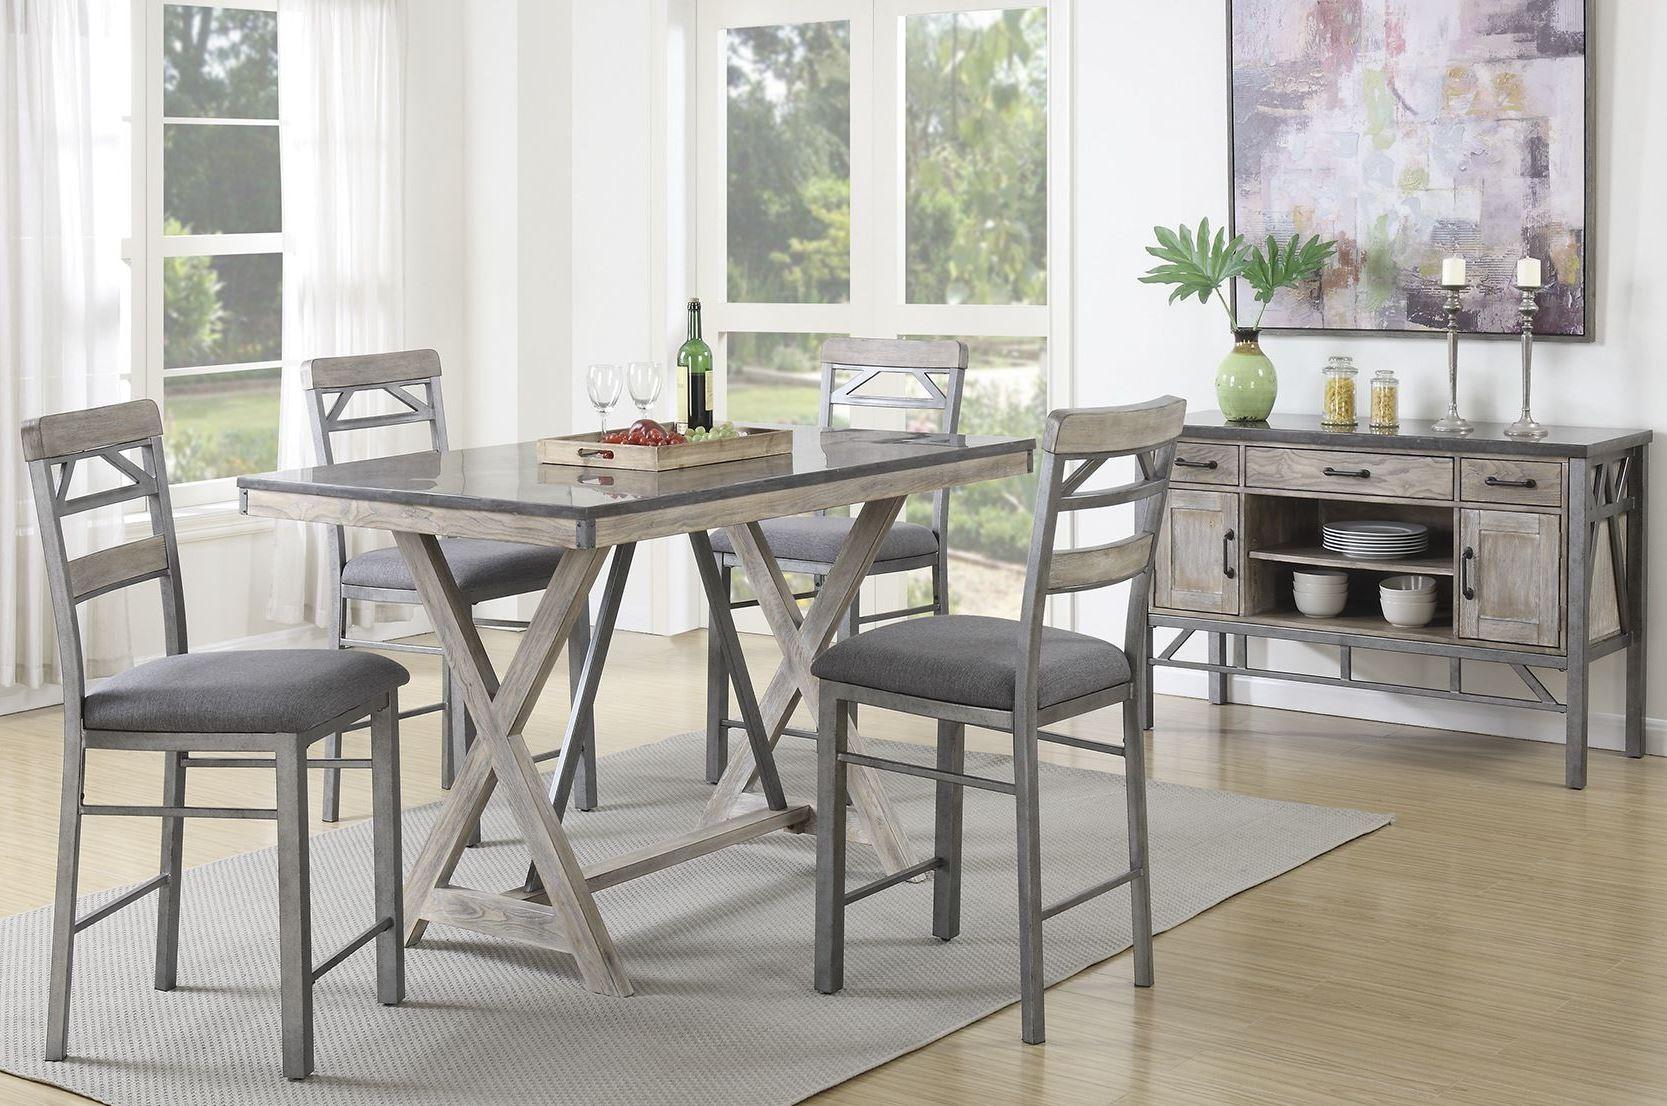 melbourne antique elm counter height dining room set